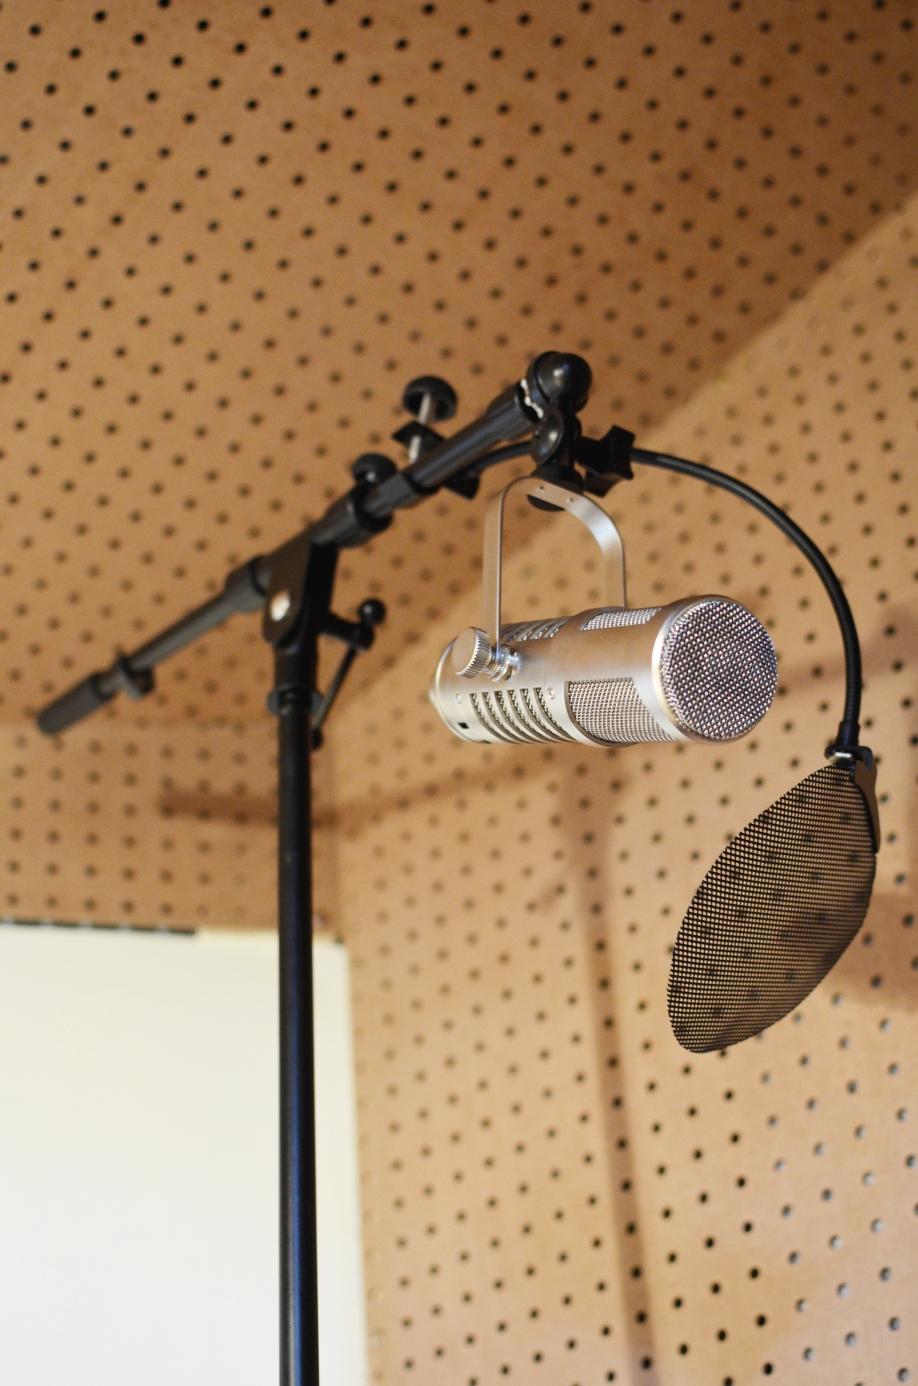 Bobbybrave Studios by Caitlin Perry and Robert Bravington